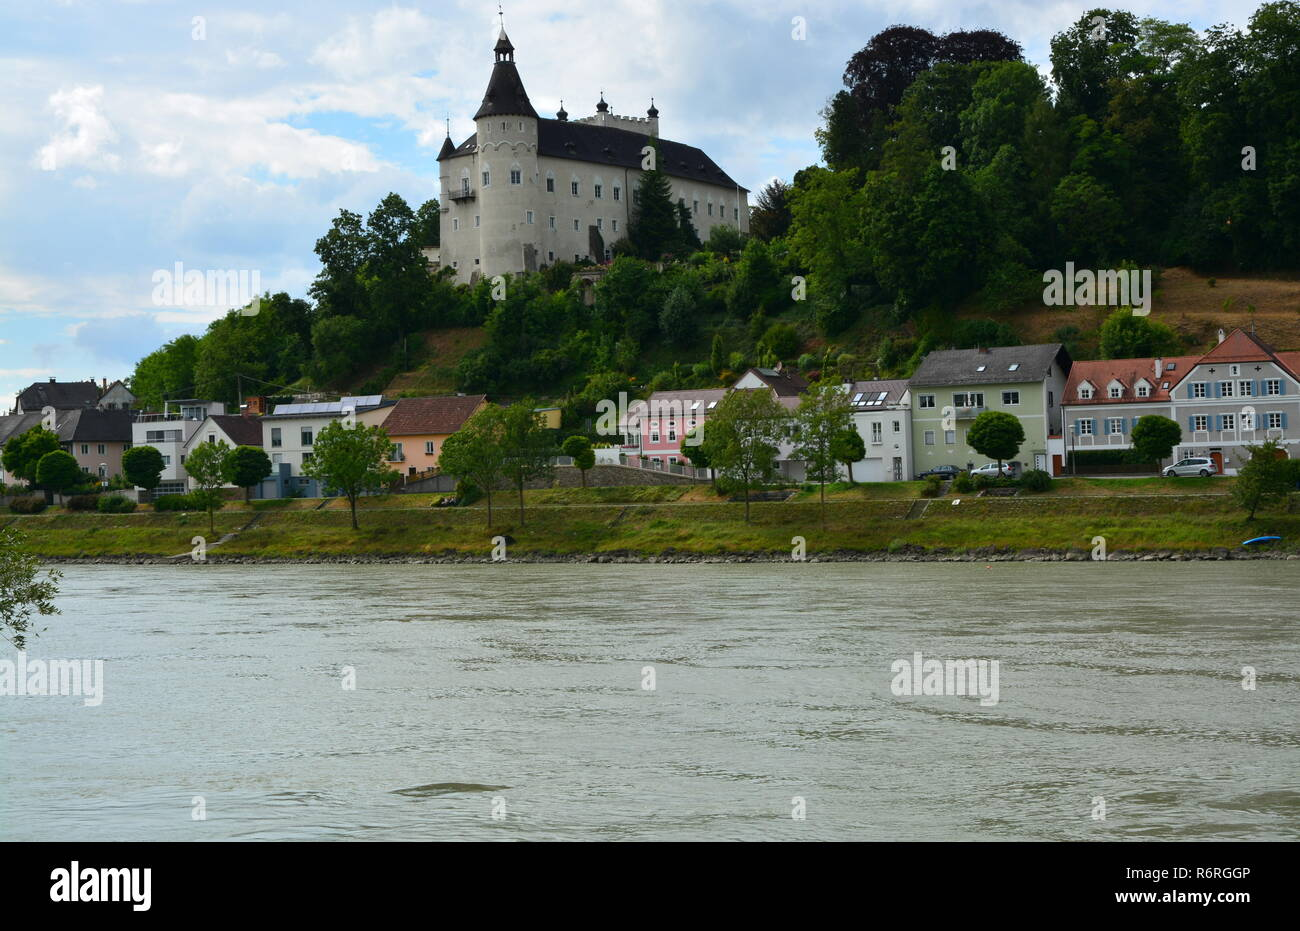 ottensheim castle on the danube Stock Photo